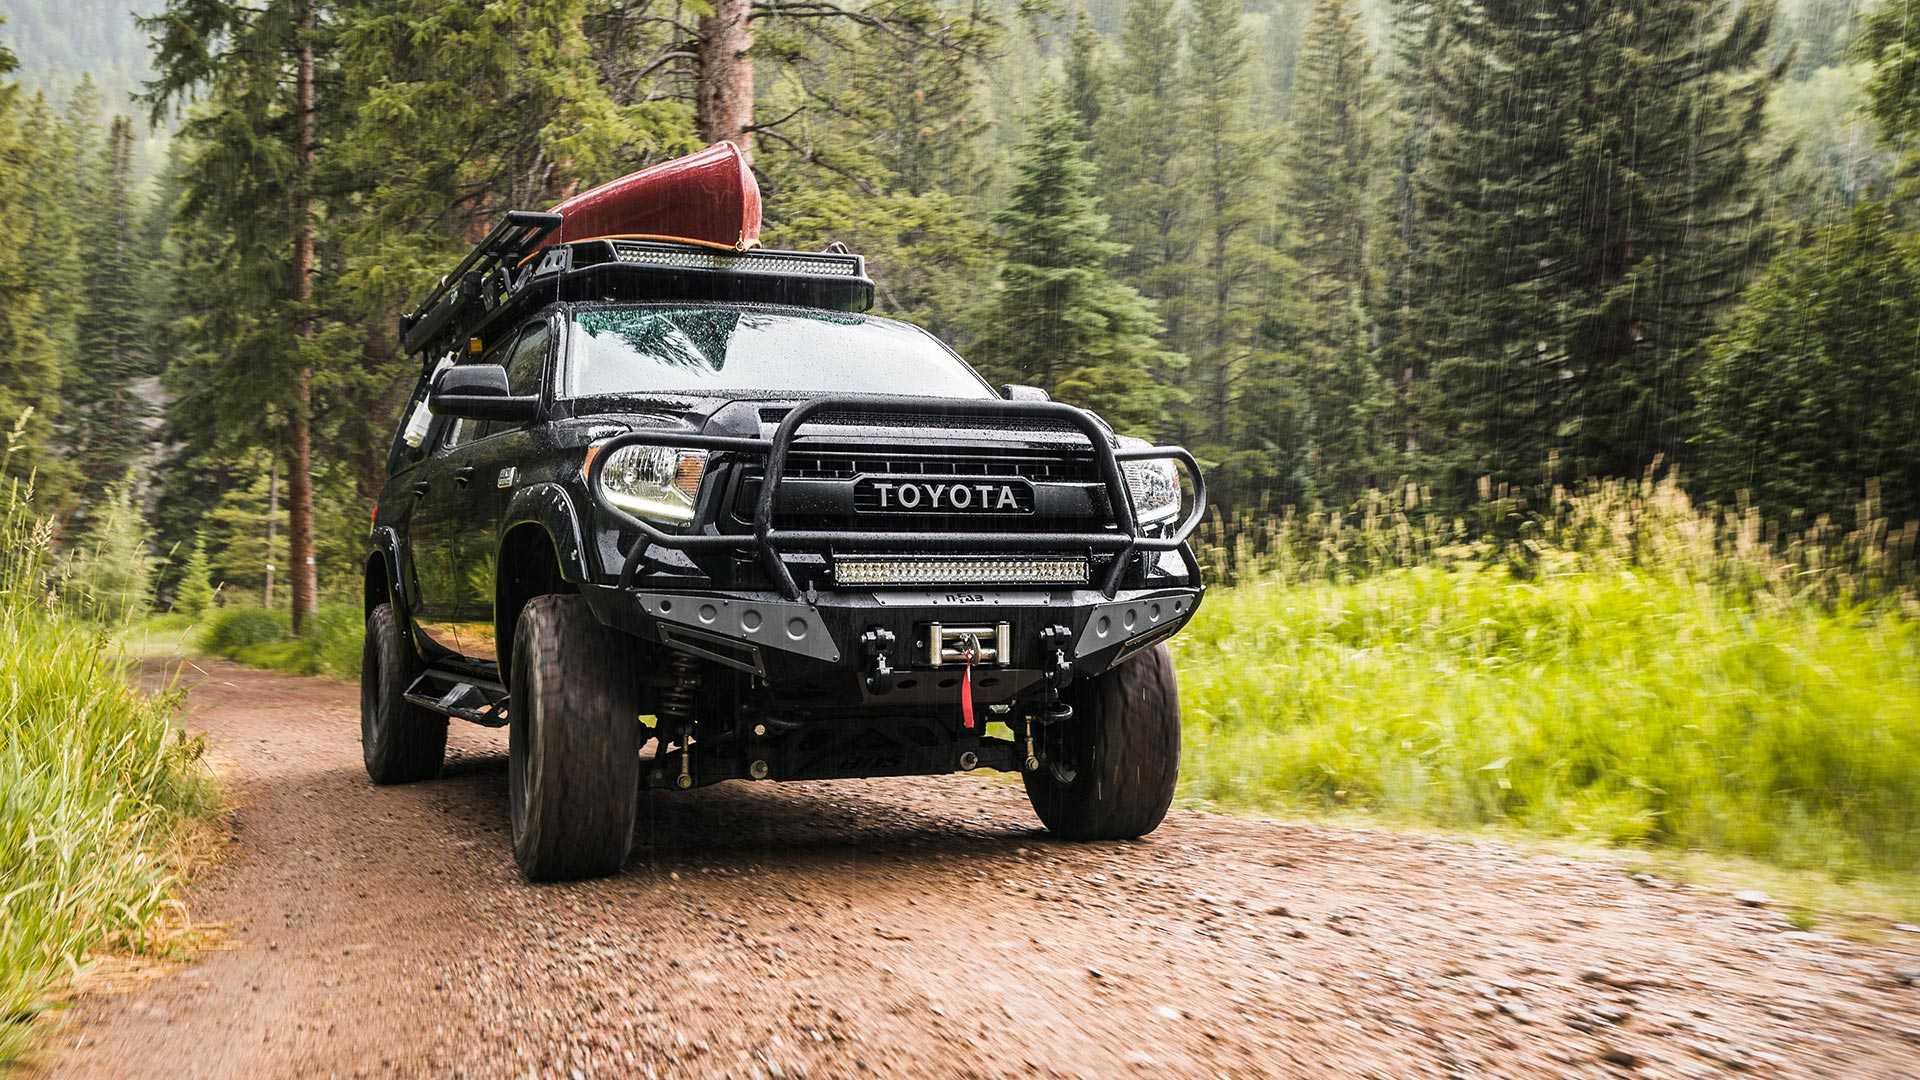 toyota-tundra-kevin-costner-custom (6)